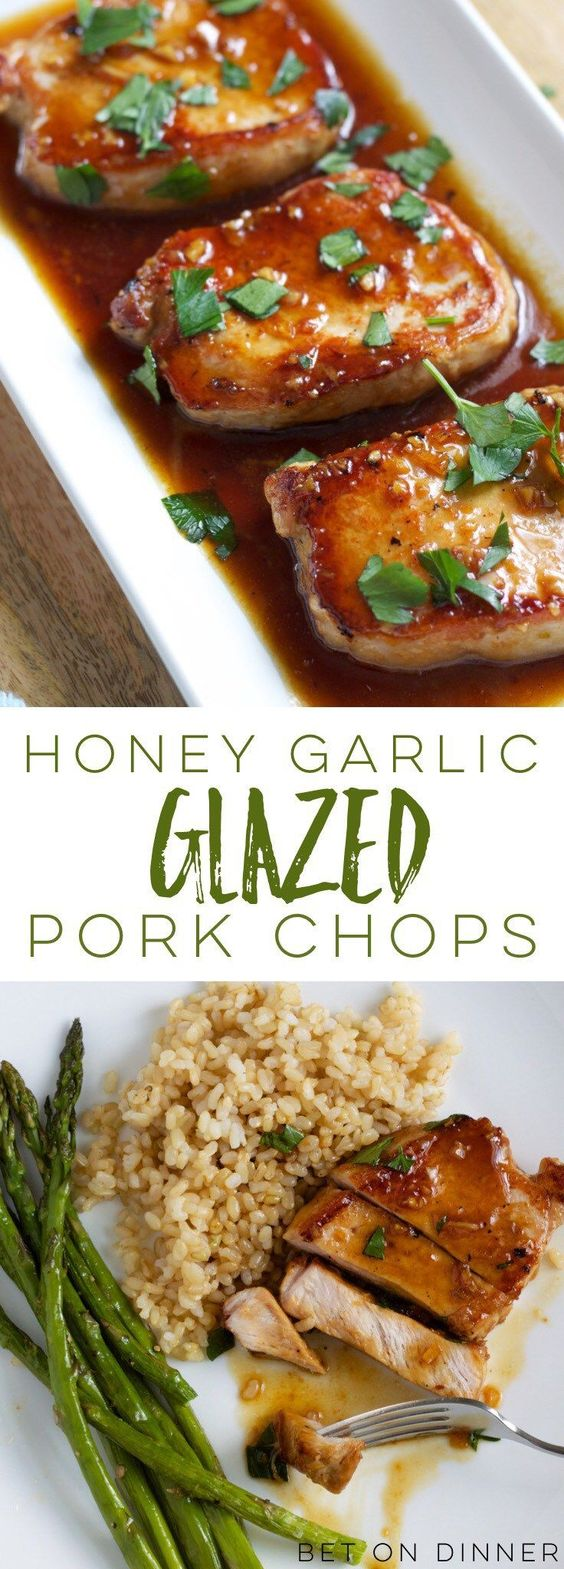 Recipe – Honey Garlic Pork Chops #honey #garlic #pork #chops #dinner #dinnerrecipes #dinnerideas